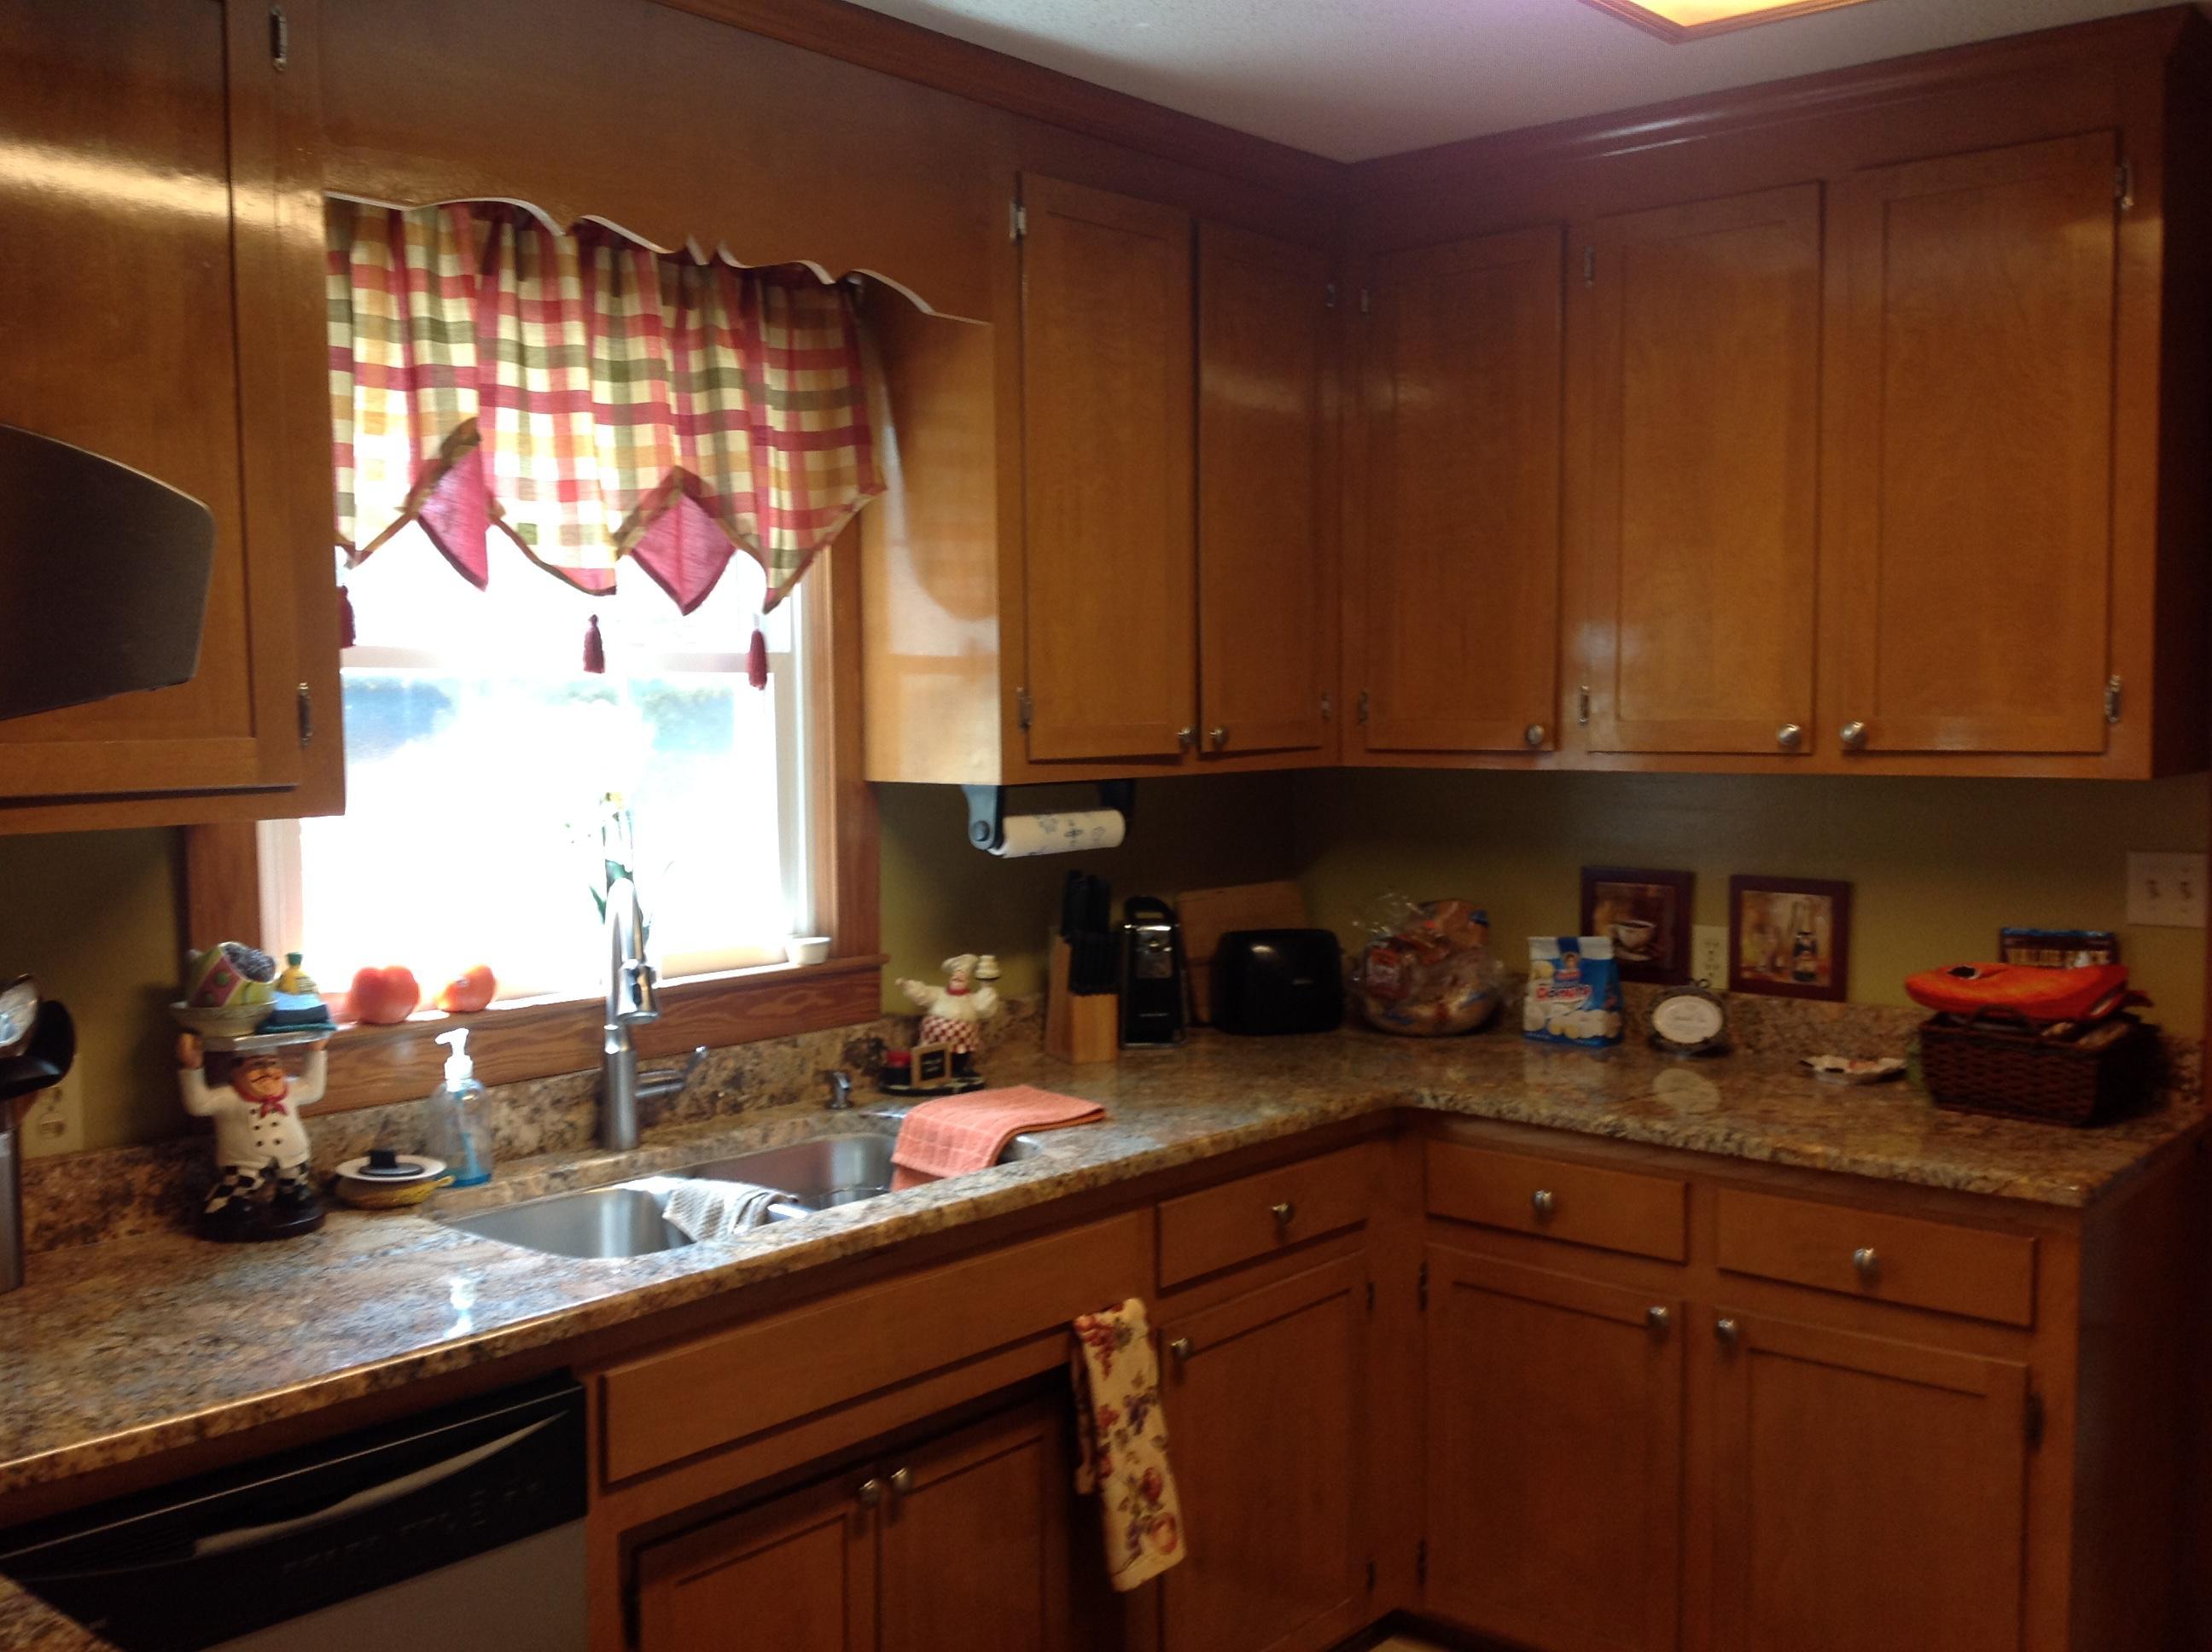 Belvedere II Homes For Sale - 122 Dogwood, Eutawville, SC - 23